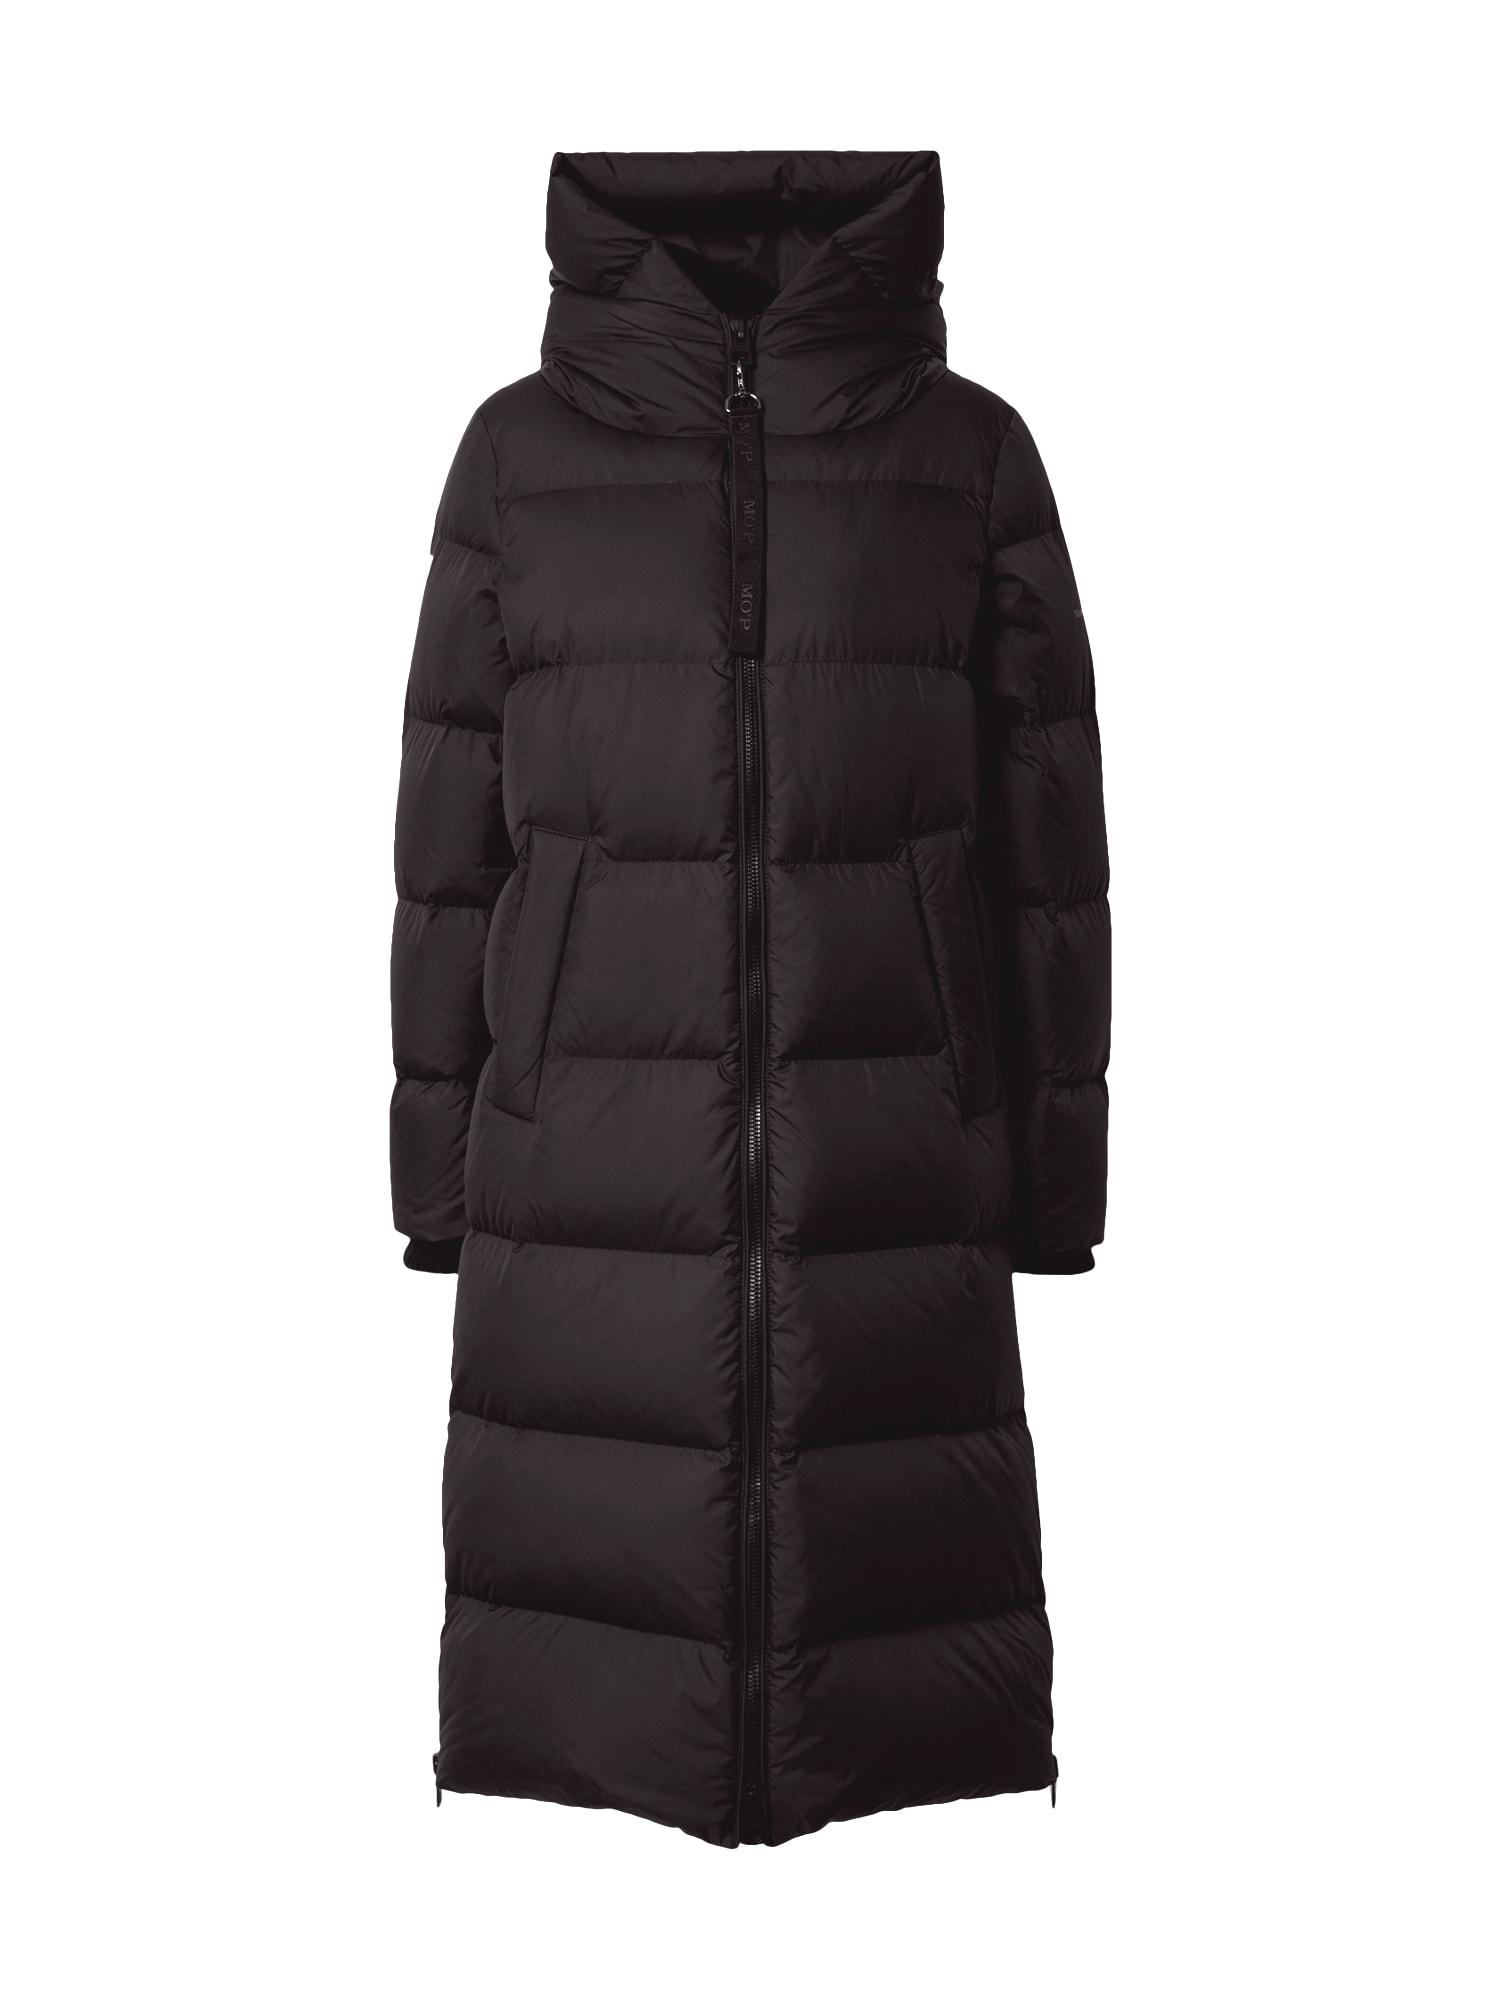 Marc O'Polo Zimní kabát 'WOVEN COATS'  černá